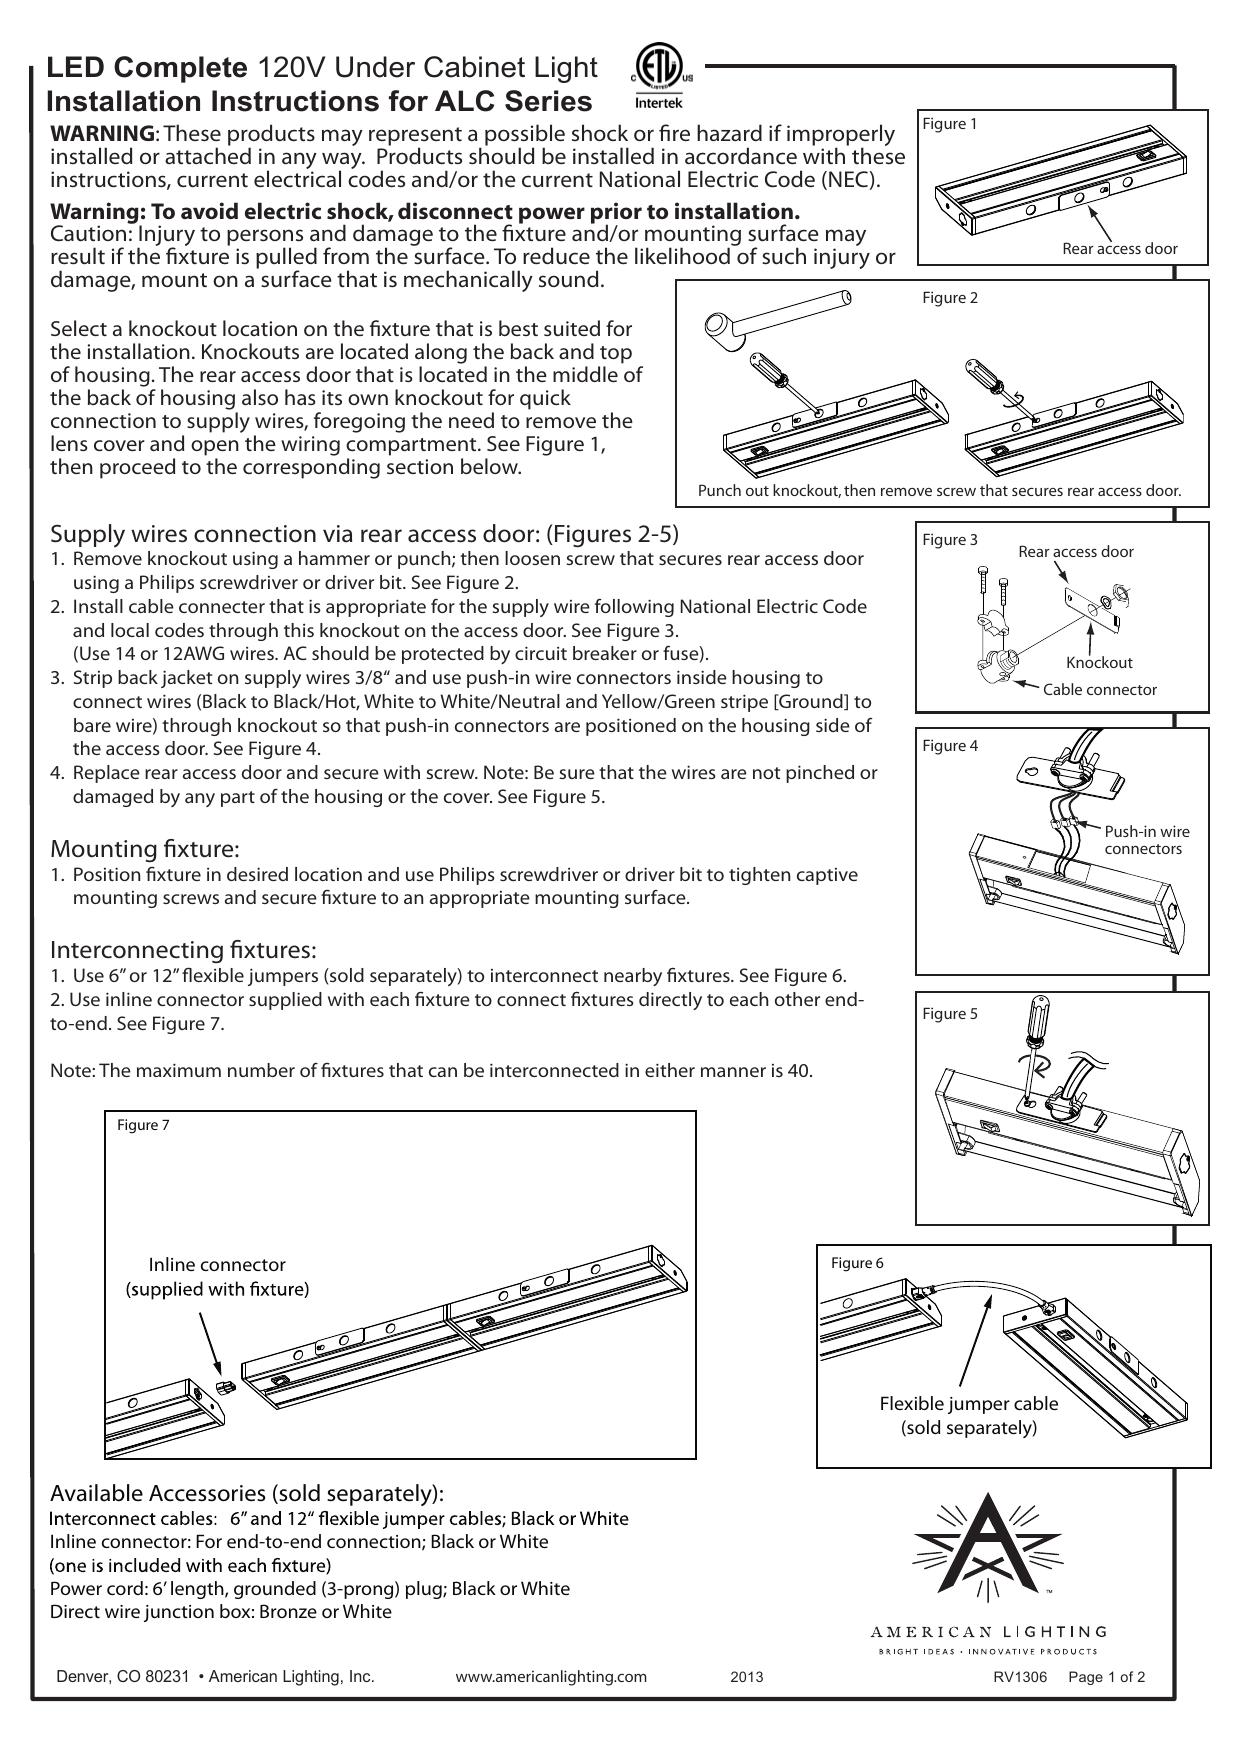 American Lighting Alc 32 Wh Instructions Manualzz